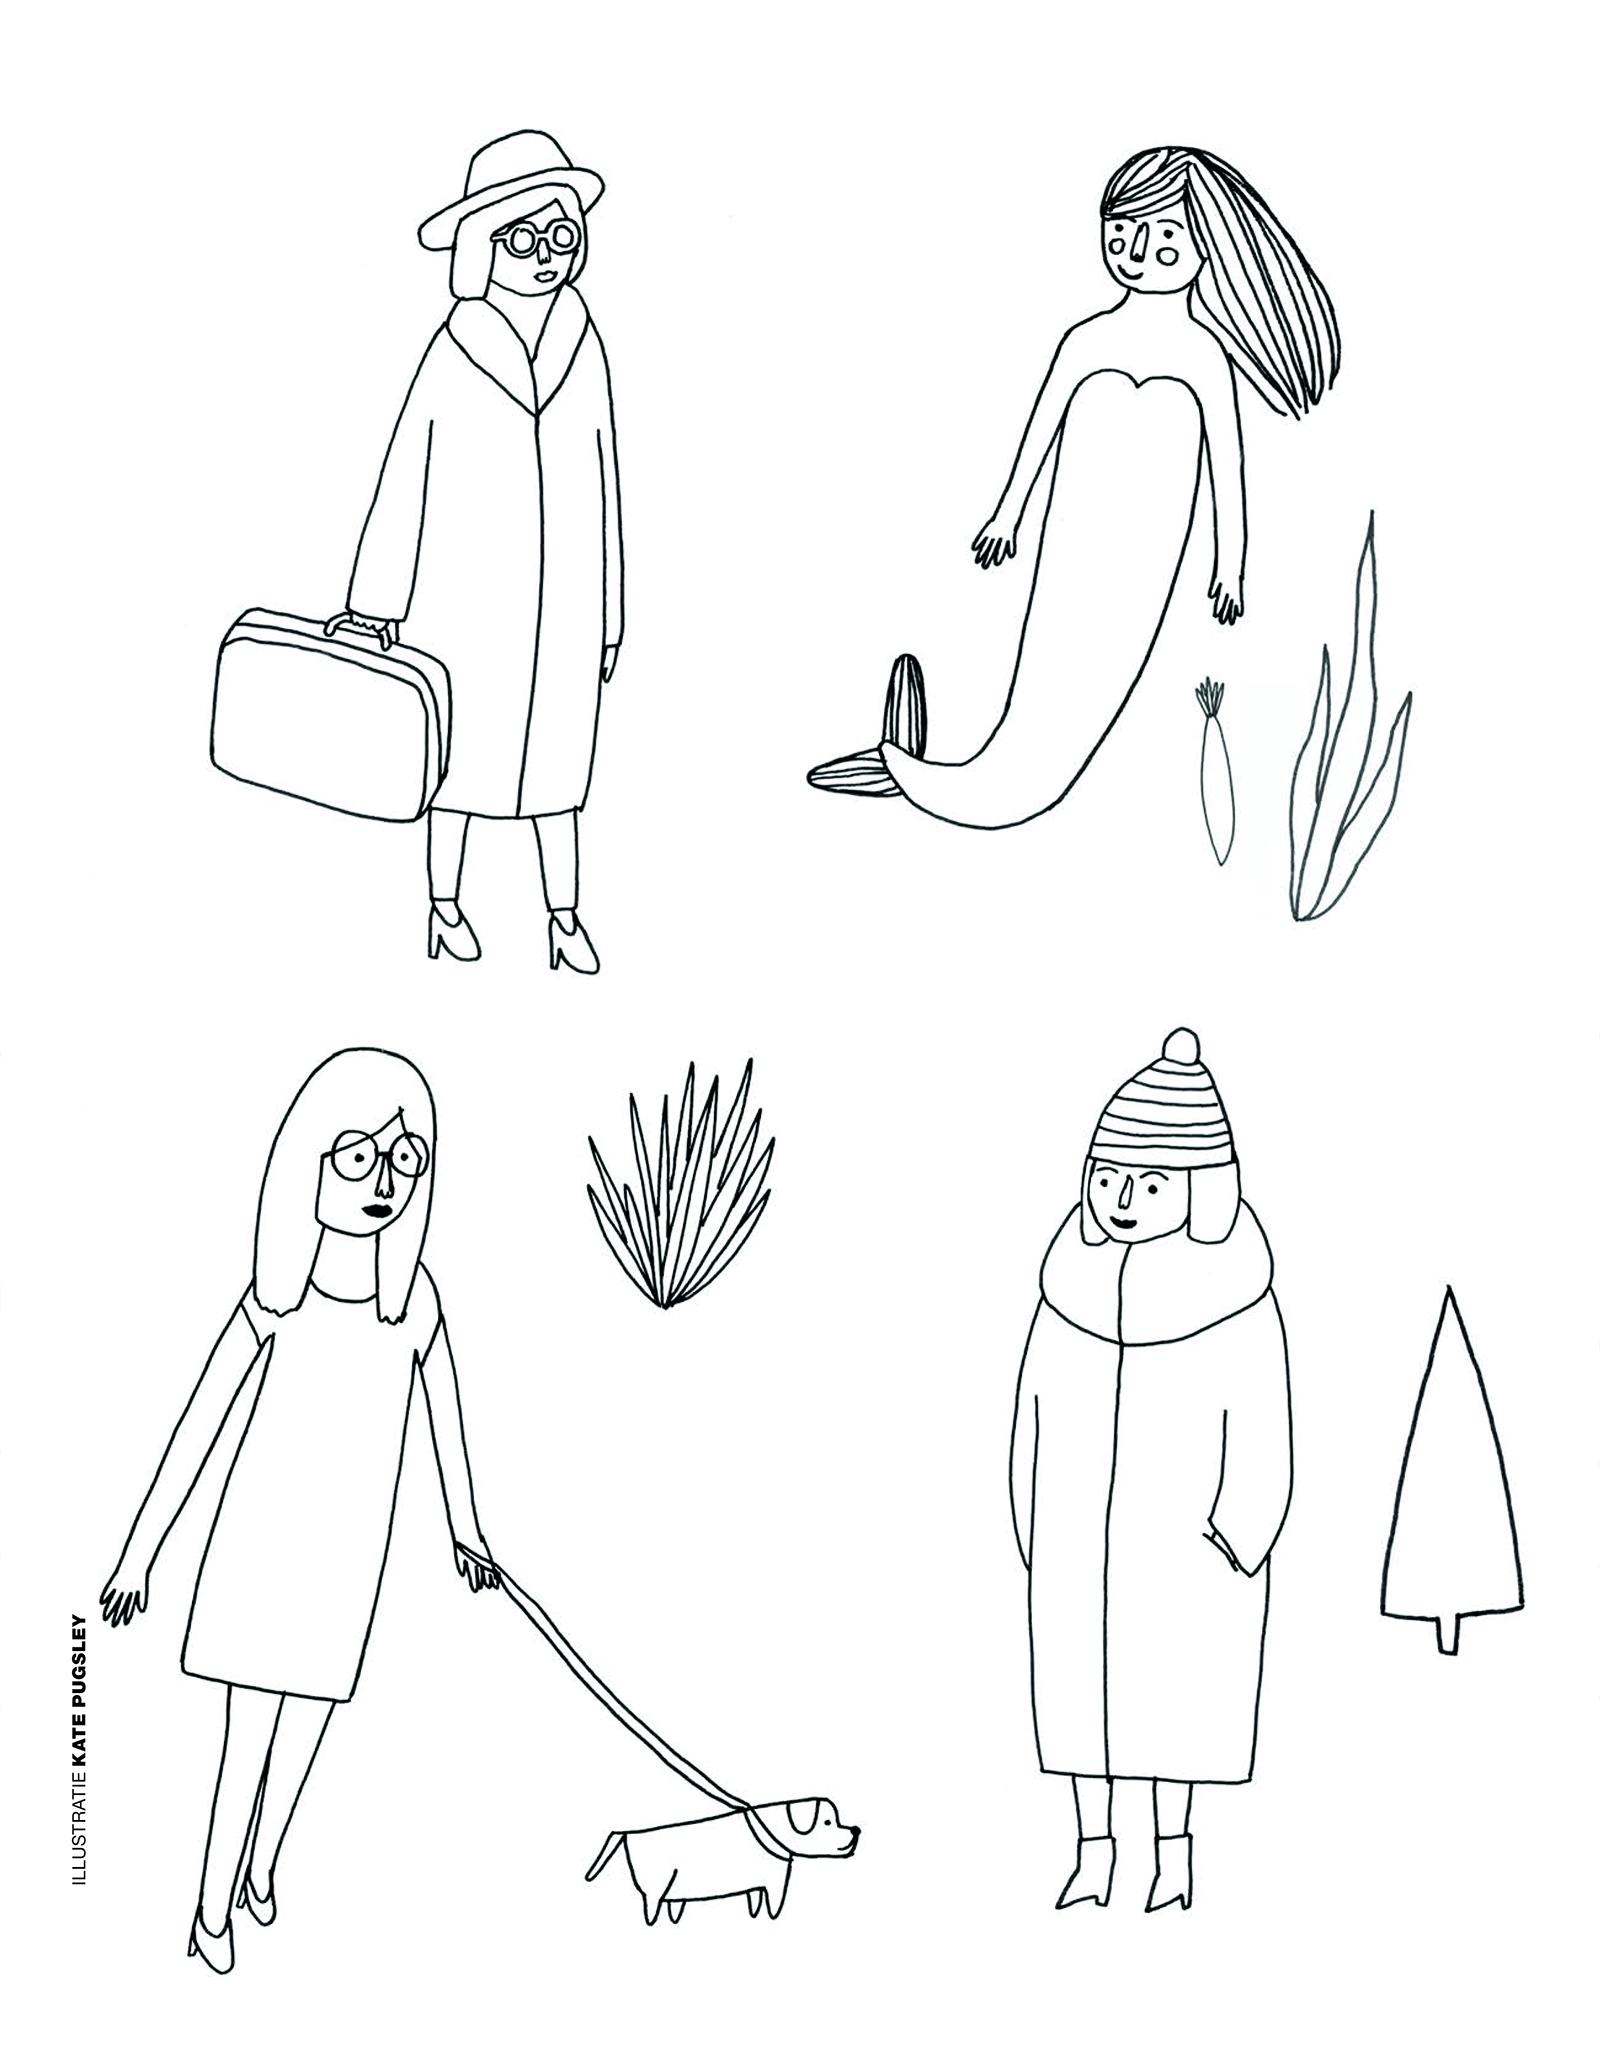 Print https://bin.snmmd.nl/m/1h17ojm2xpxb.jpg/_flow-magazine-coloring-page-6-kate-pugsley.jpg